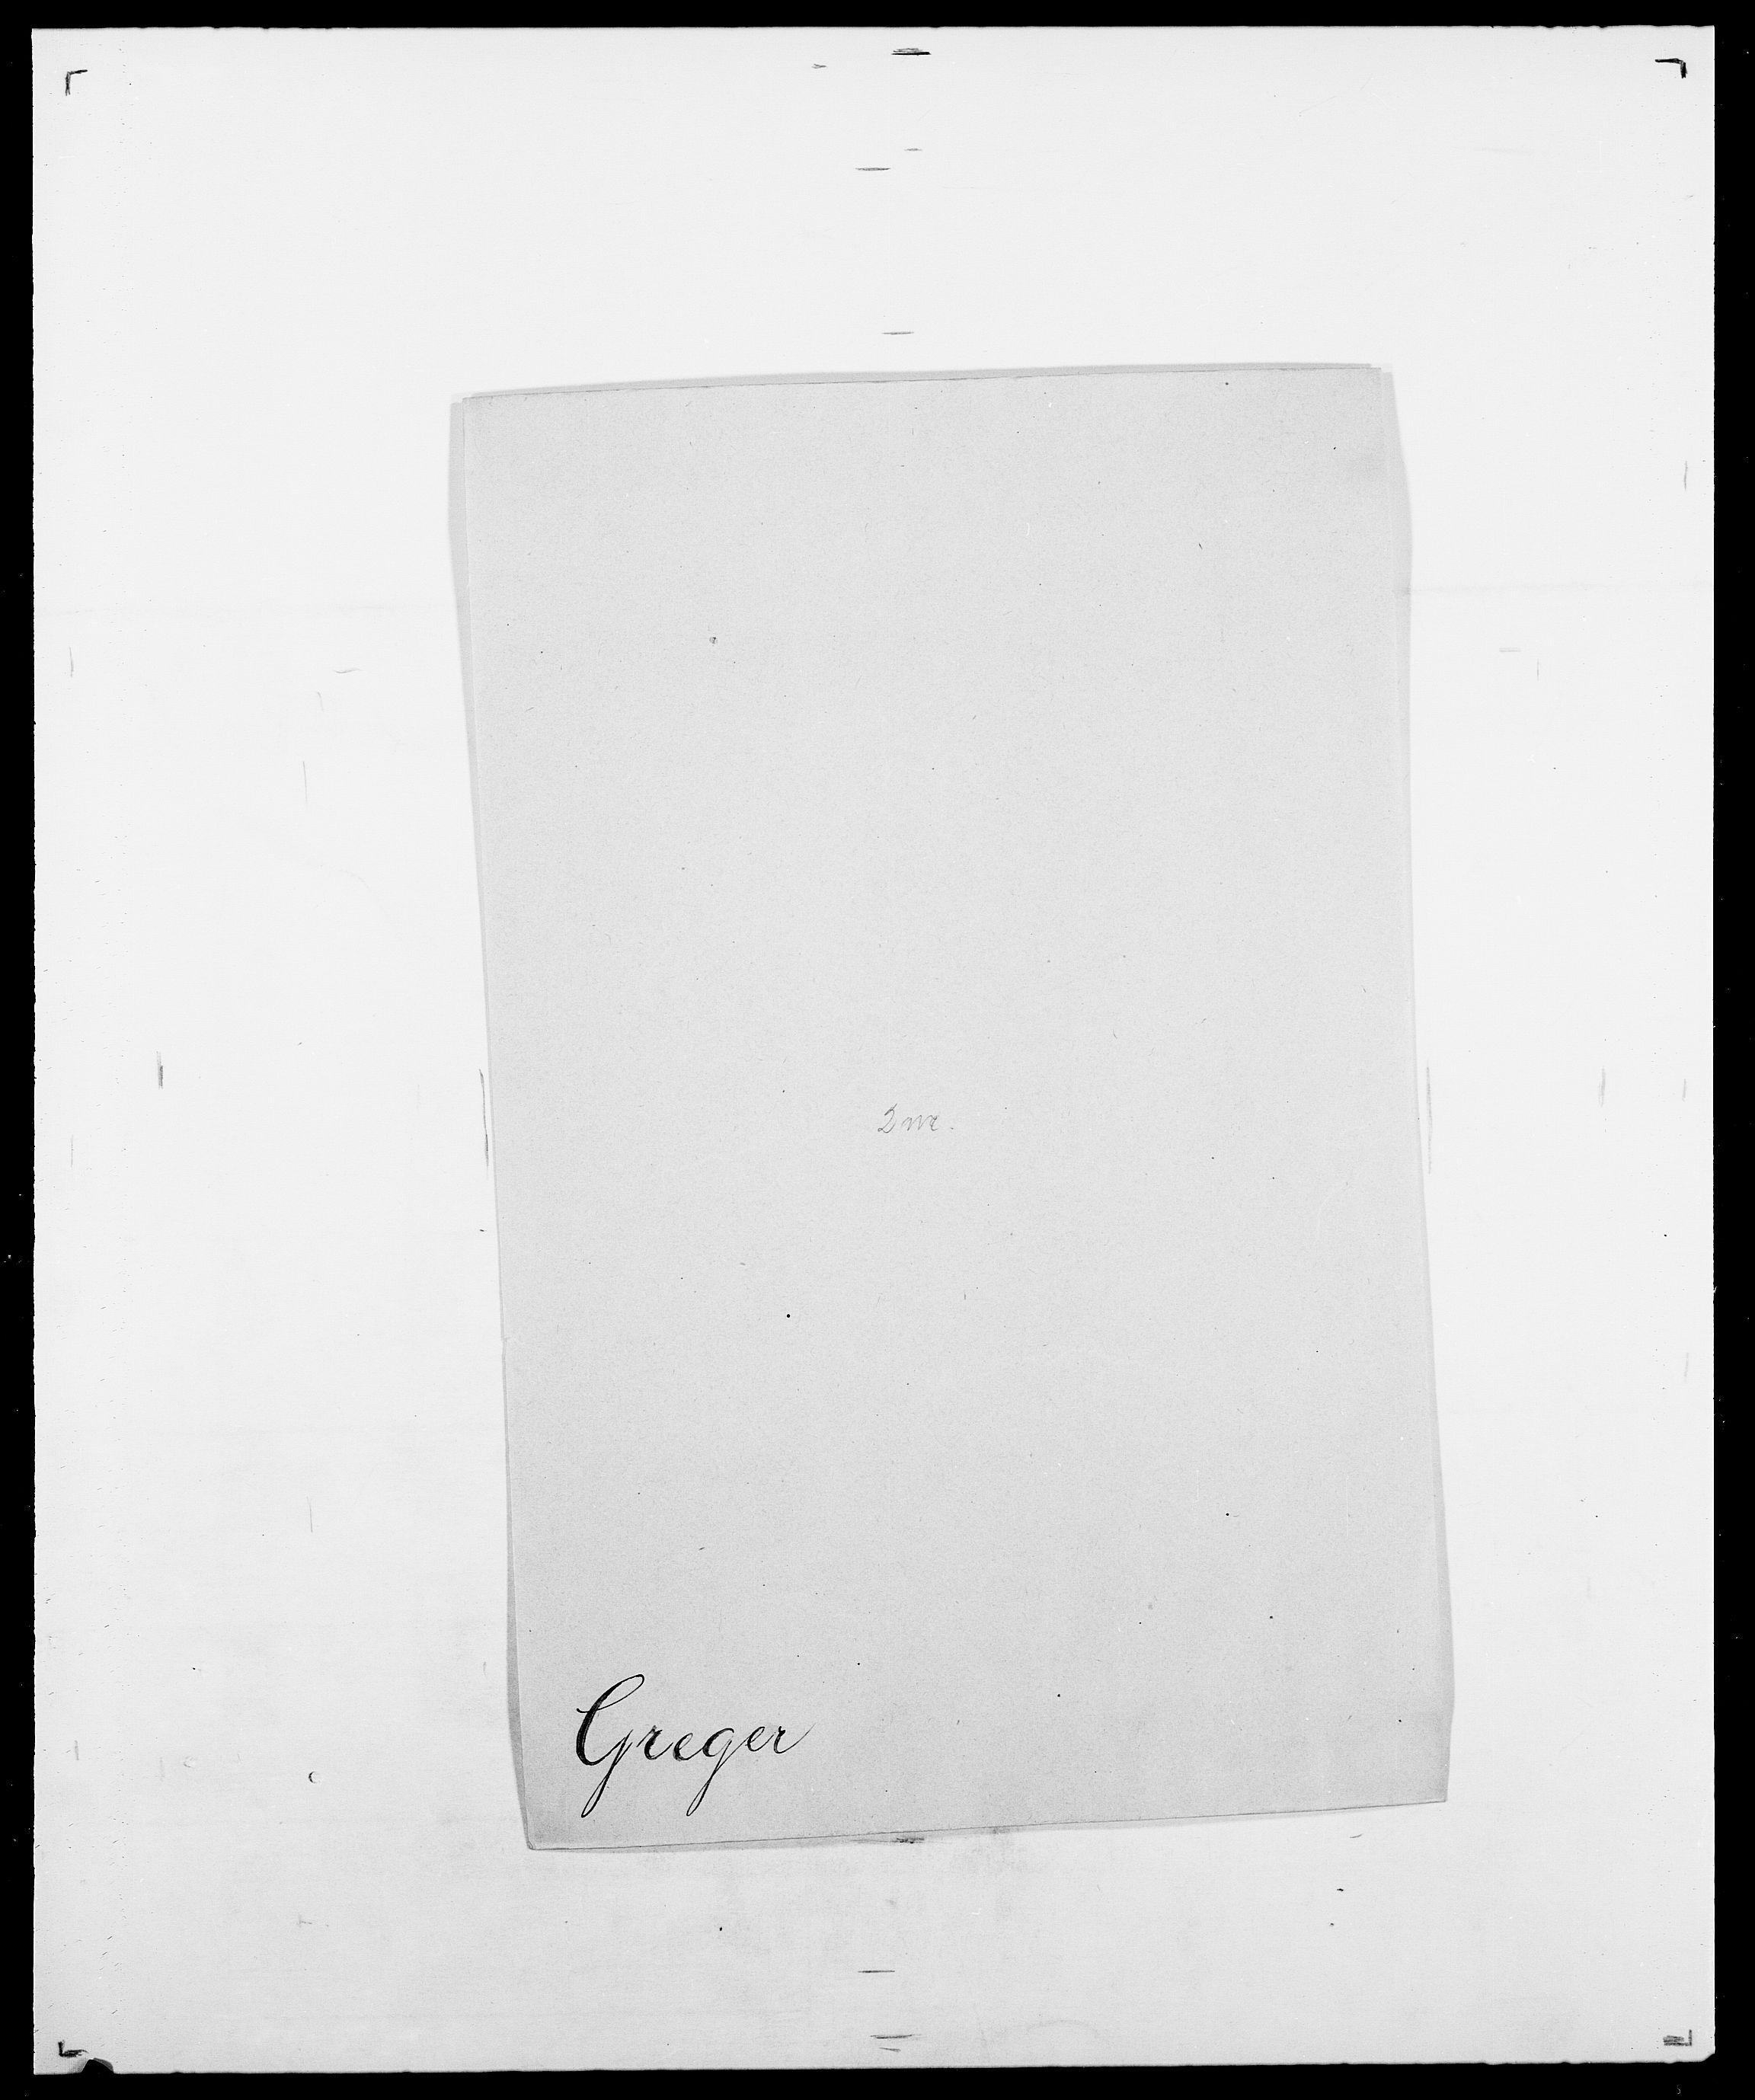 SAO, Delgobe, Charles Antoine - samling, D/Da/L0014: Giebdhausen - Grip, s. 591